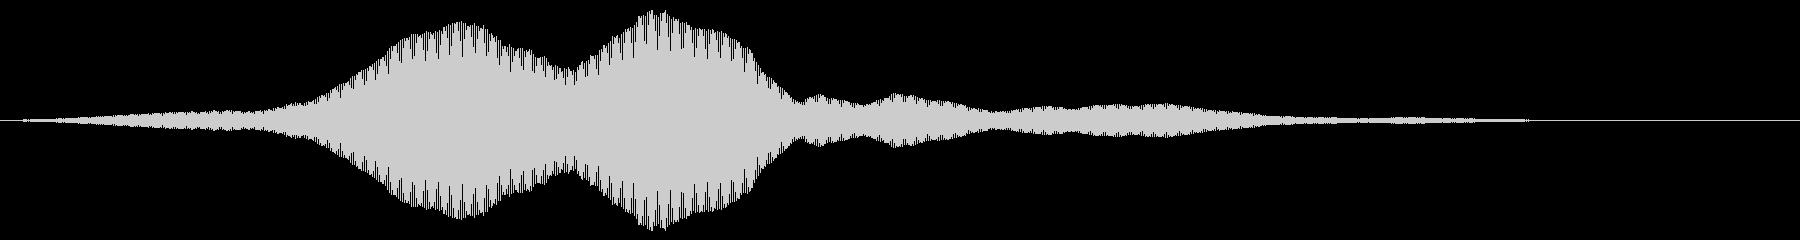 決定・神秘的・空気感・効果音の未再生の波形